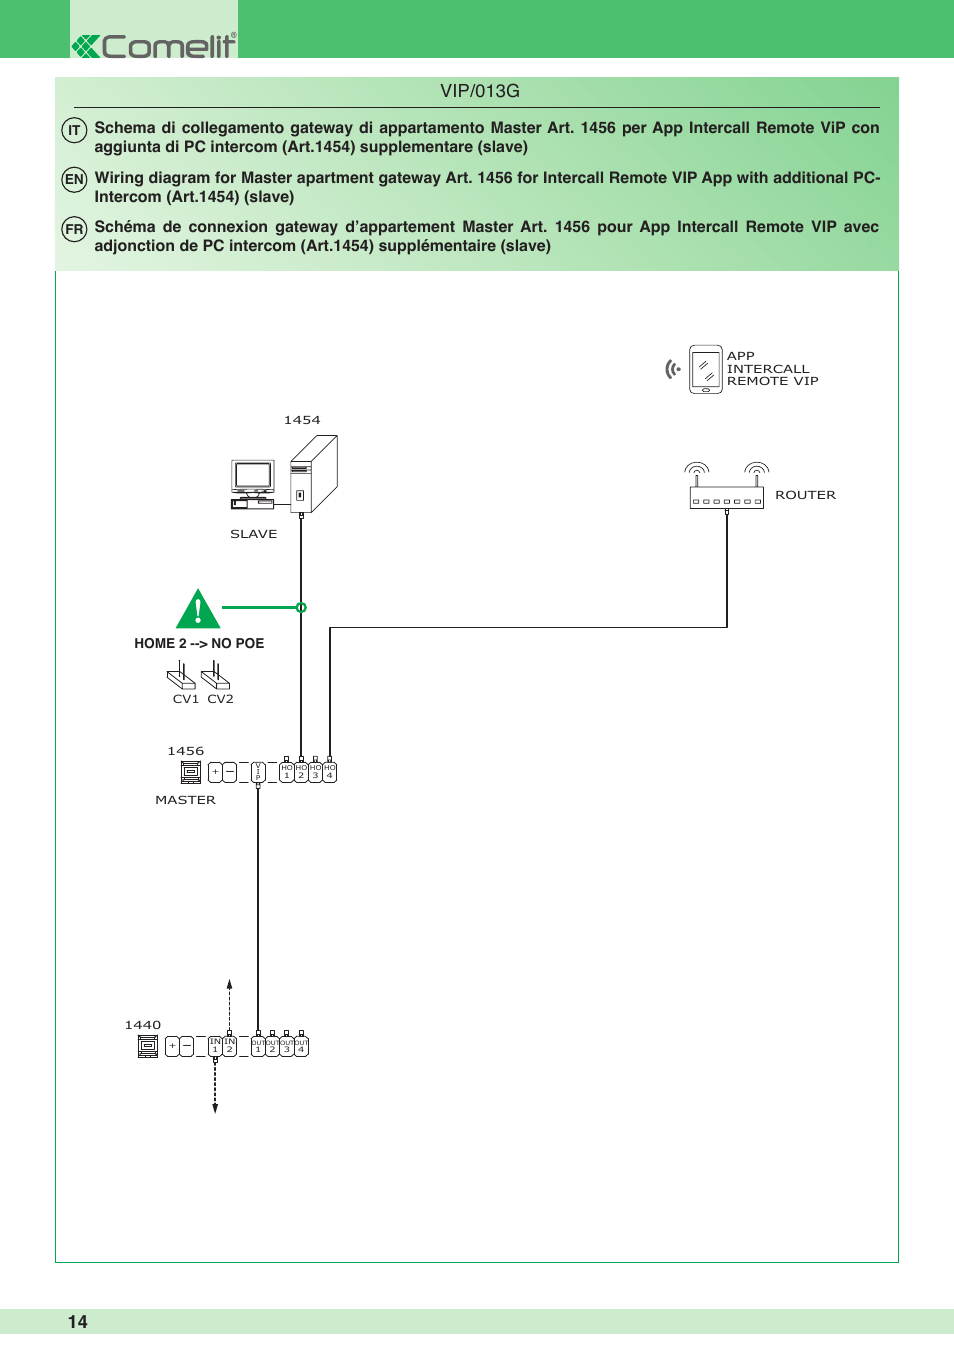 comelit wiring diagram castle worksheet vip/013g, it fr en, home 2 --> no poe | mt 1456s user manual page 14 / 16